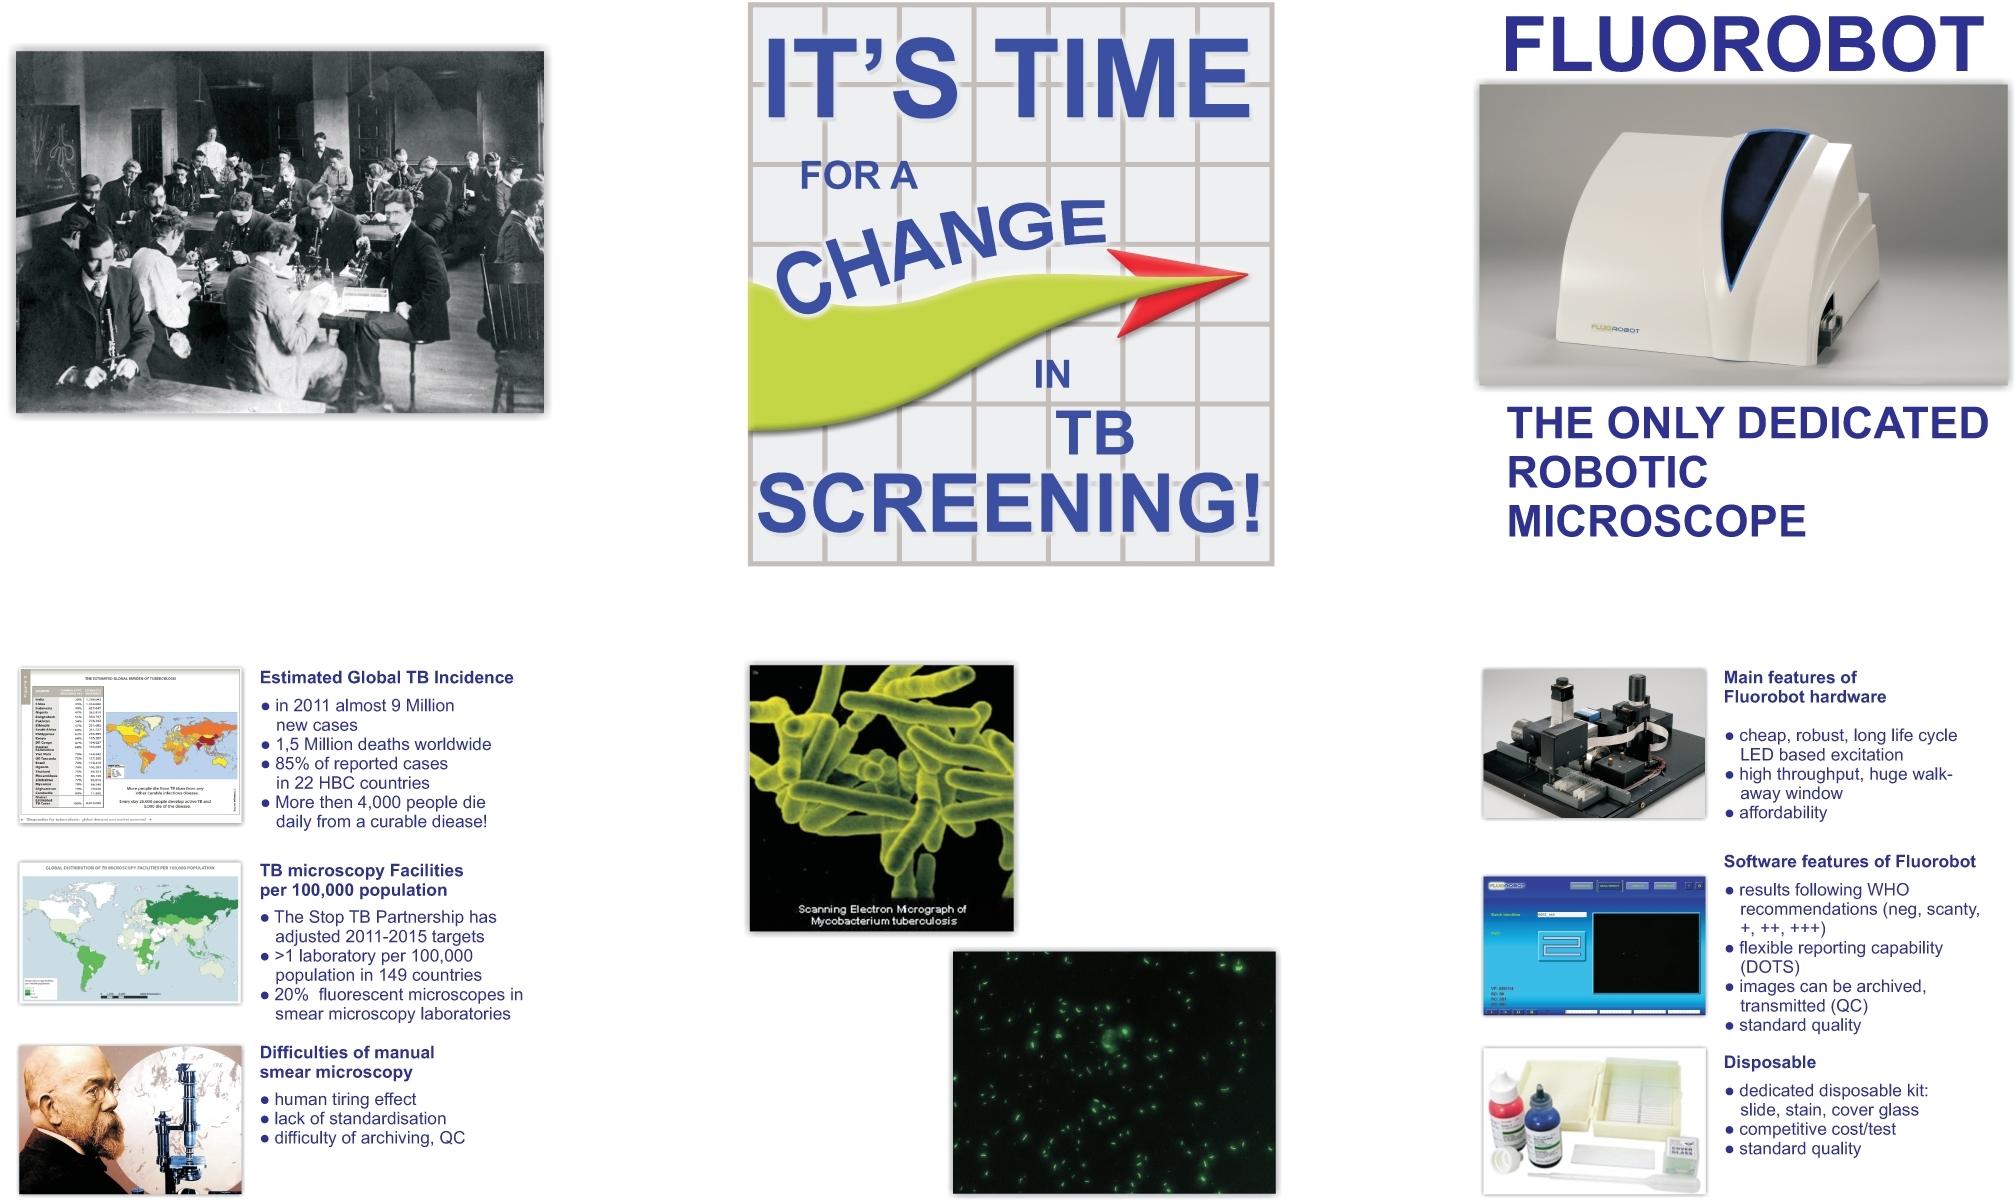 Fluorobot flyer